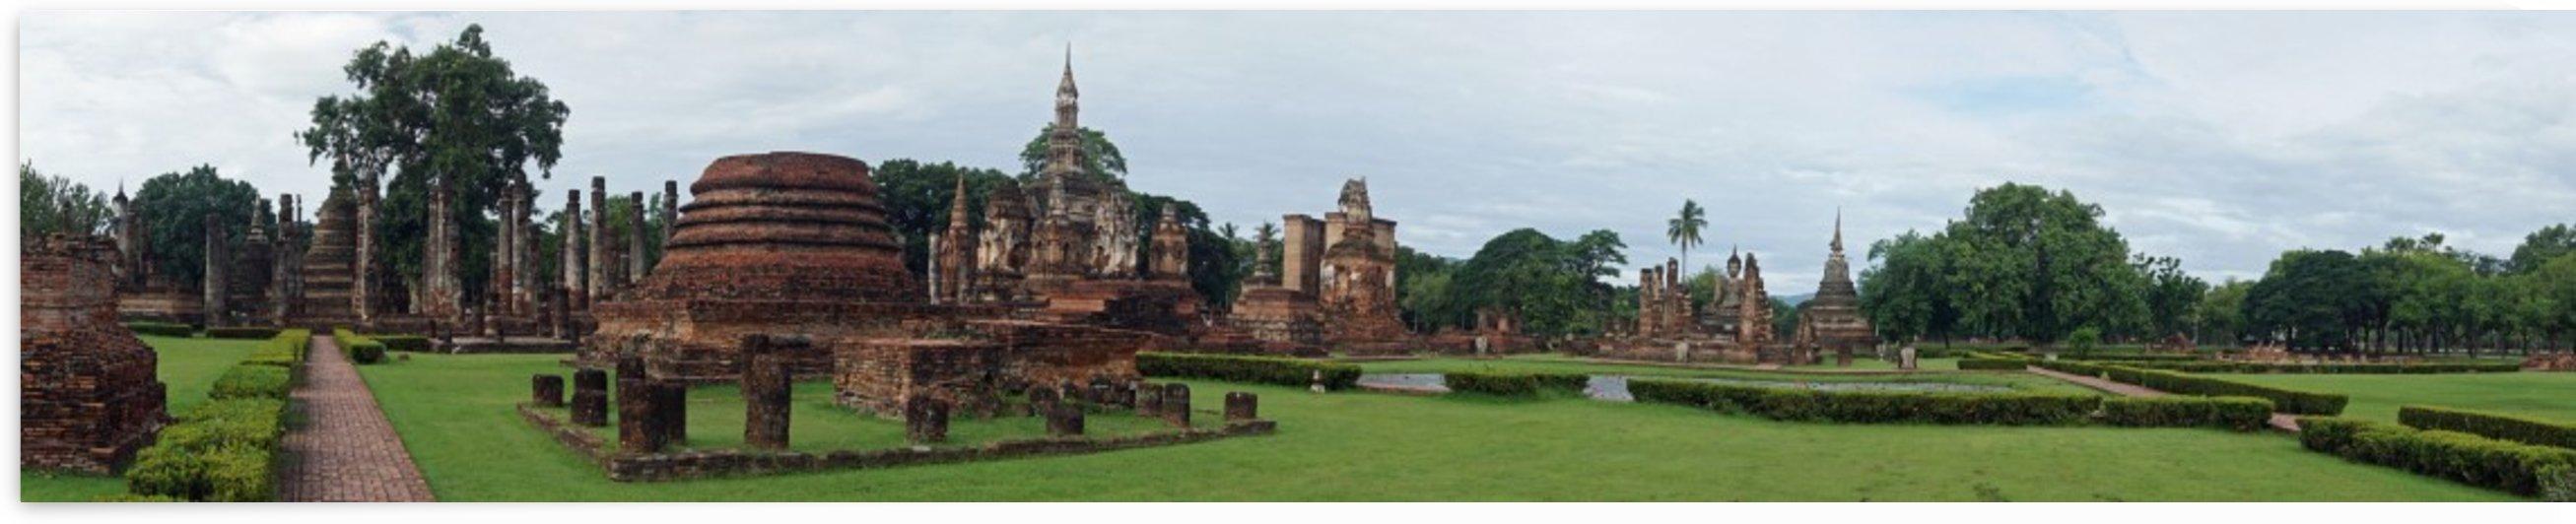 ruins in the historical park in sukhothai by Babetts Bildergalerie